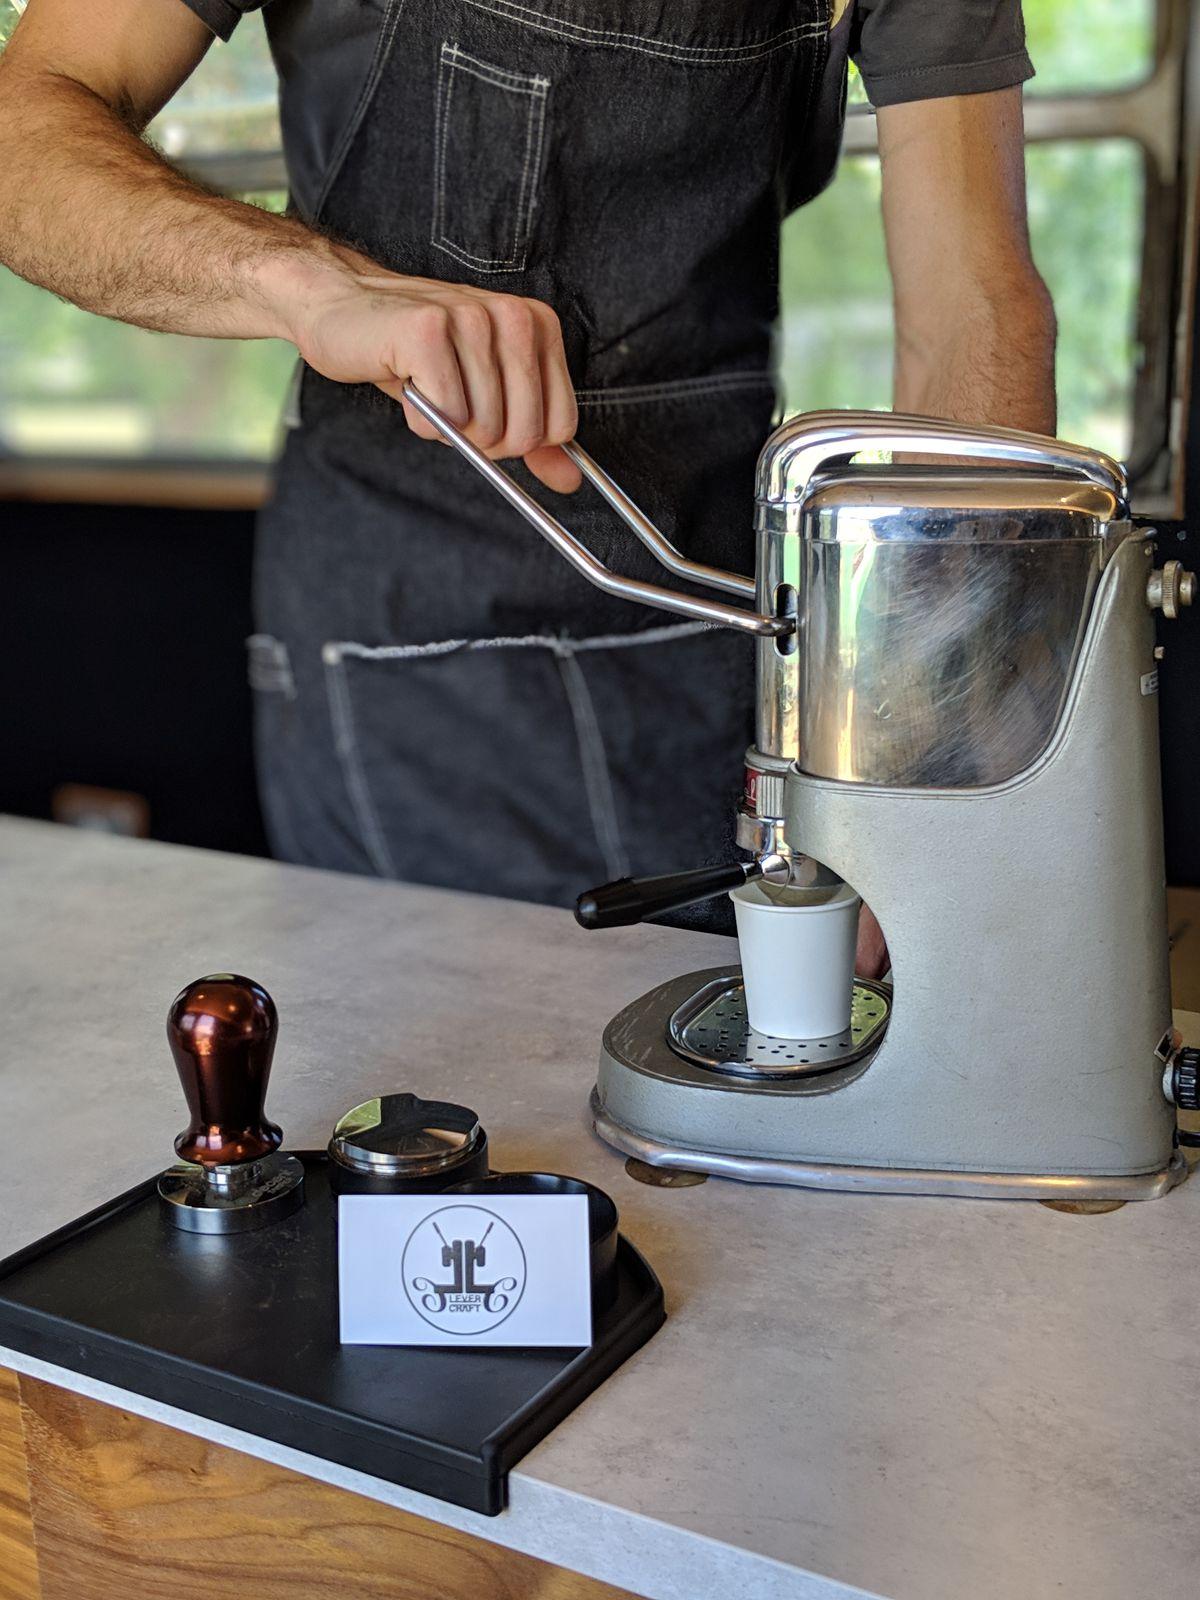 Making an espresso at LeverCraft